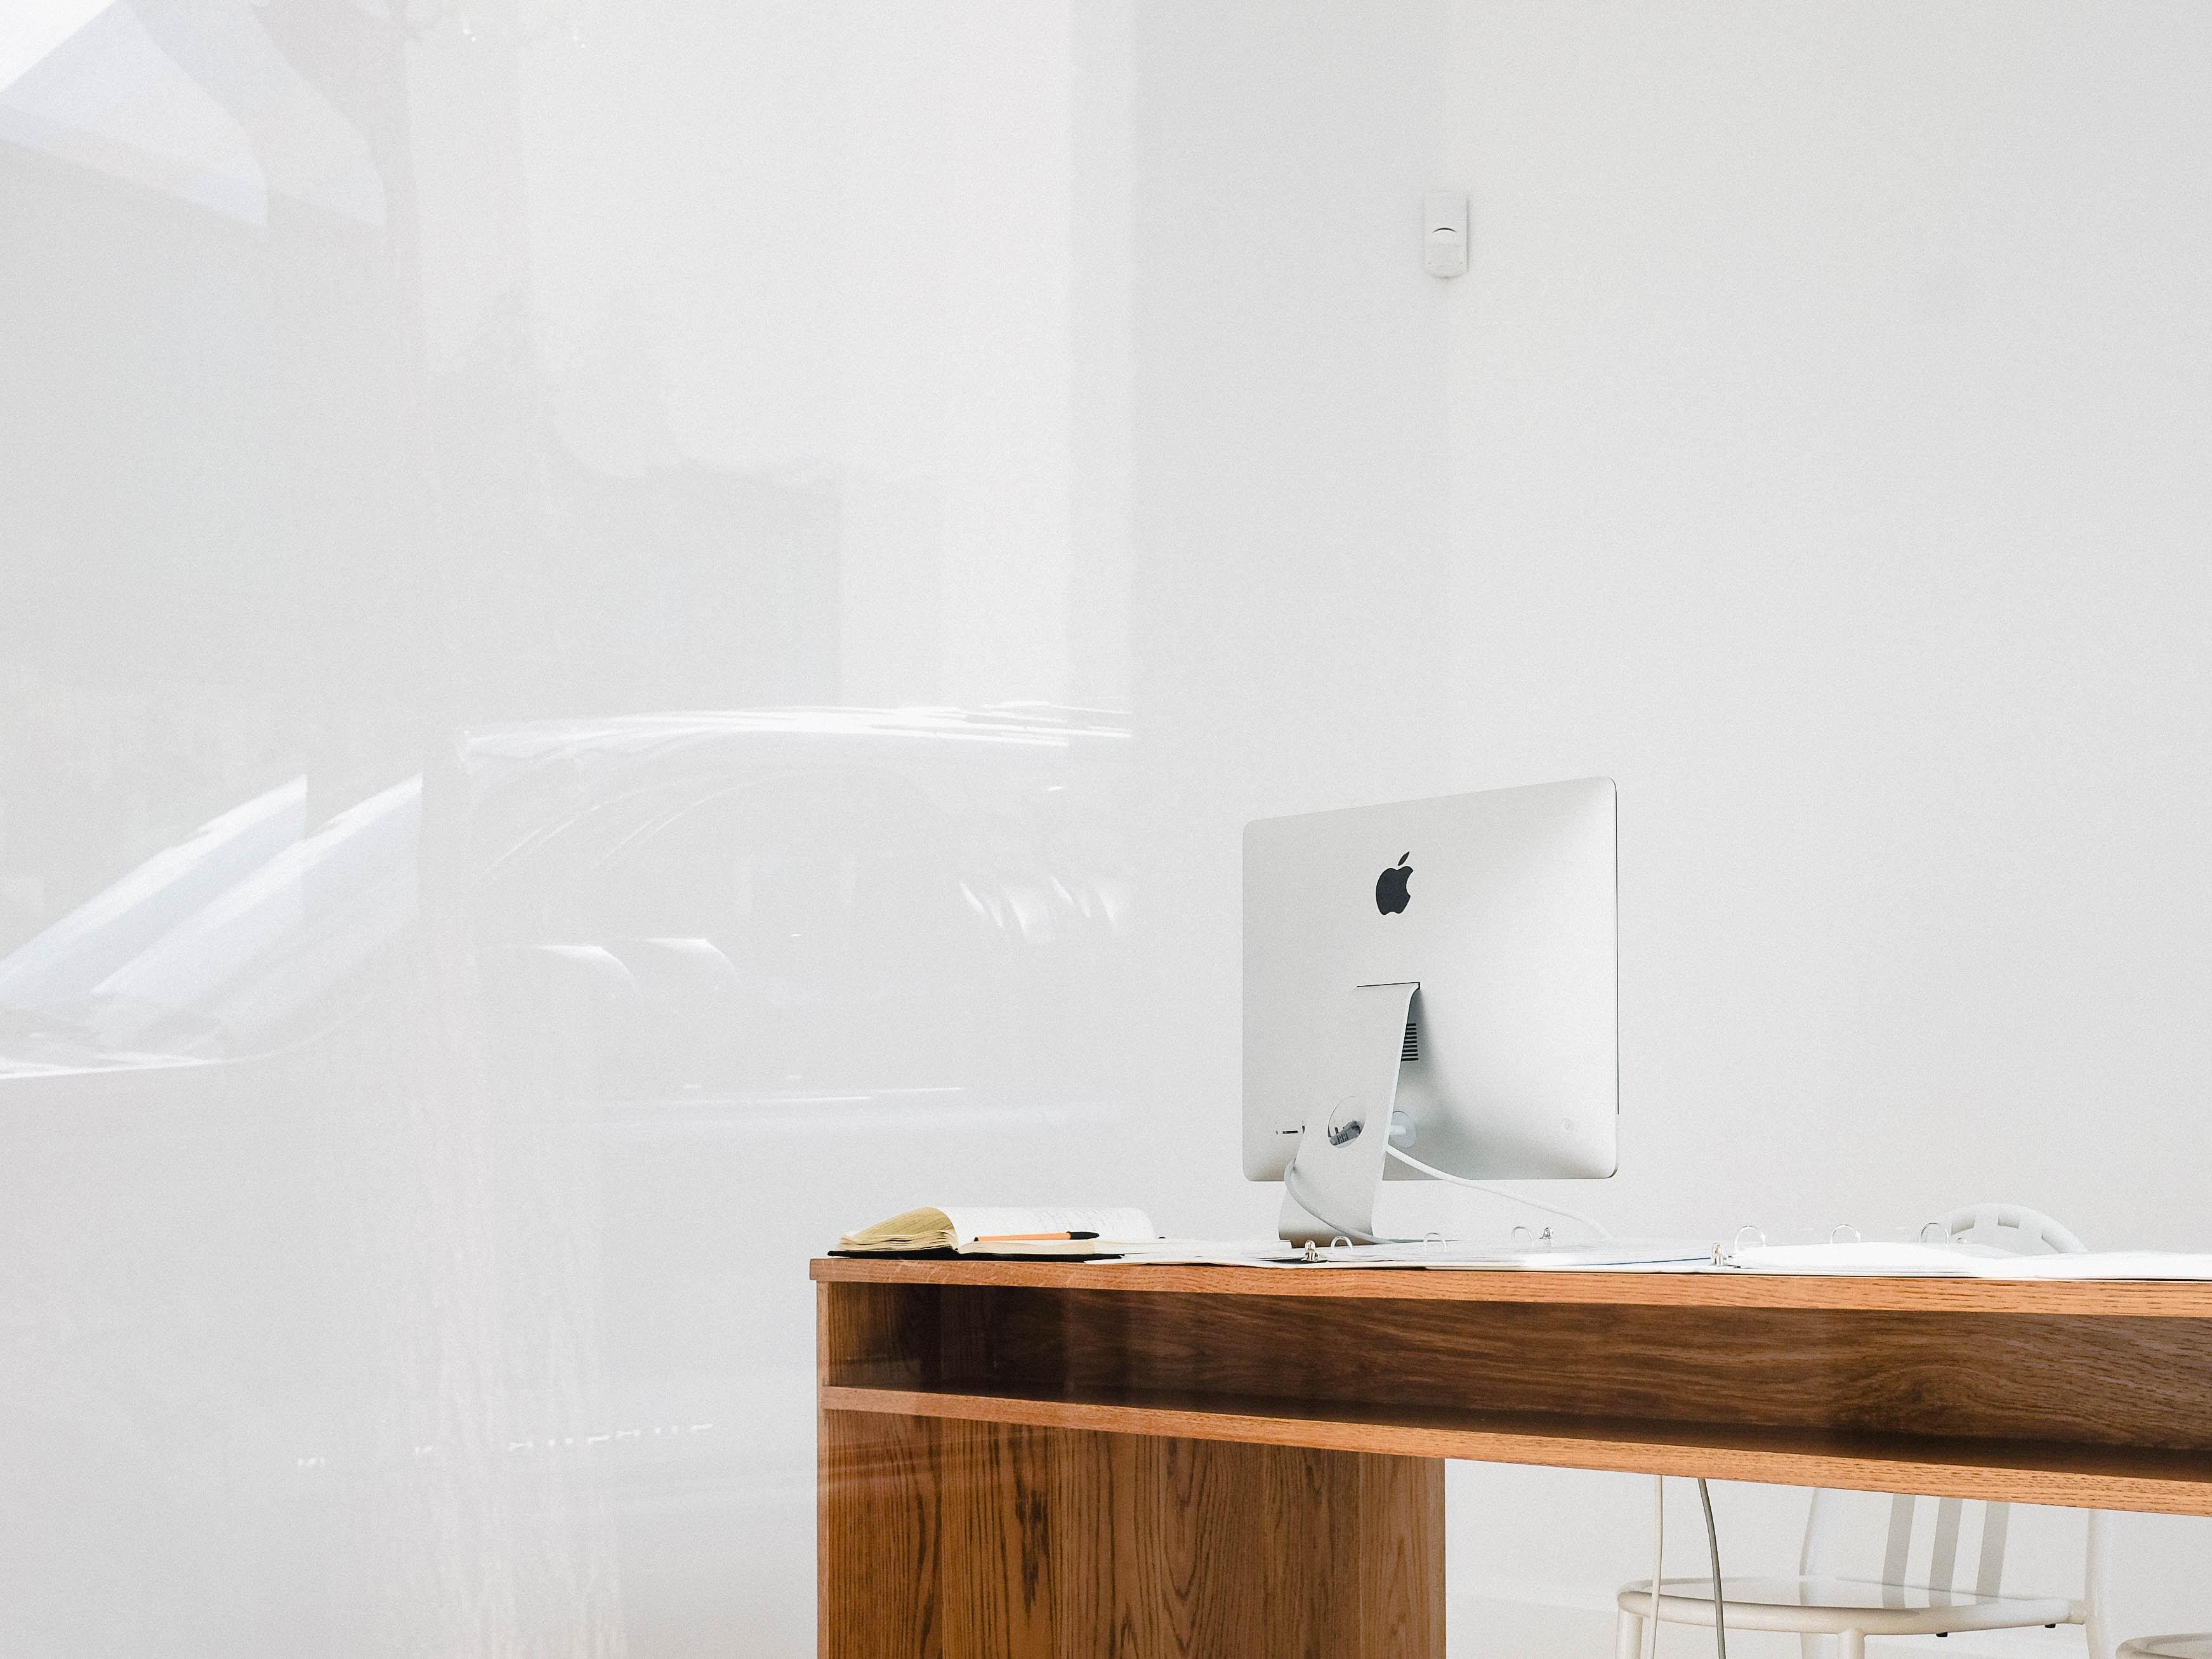 silver iMac on desk